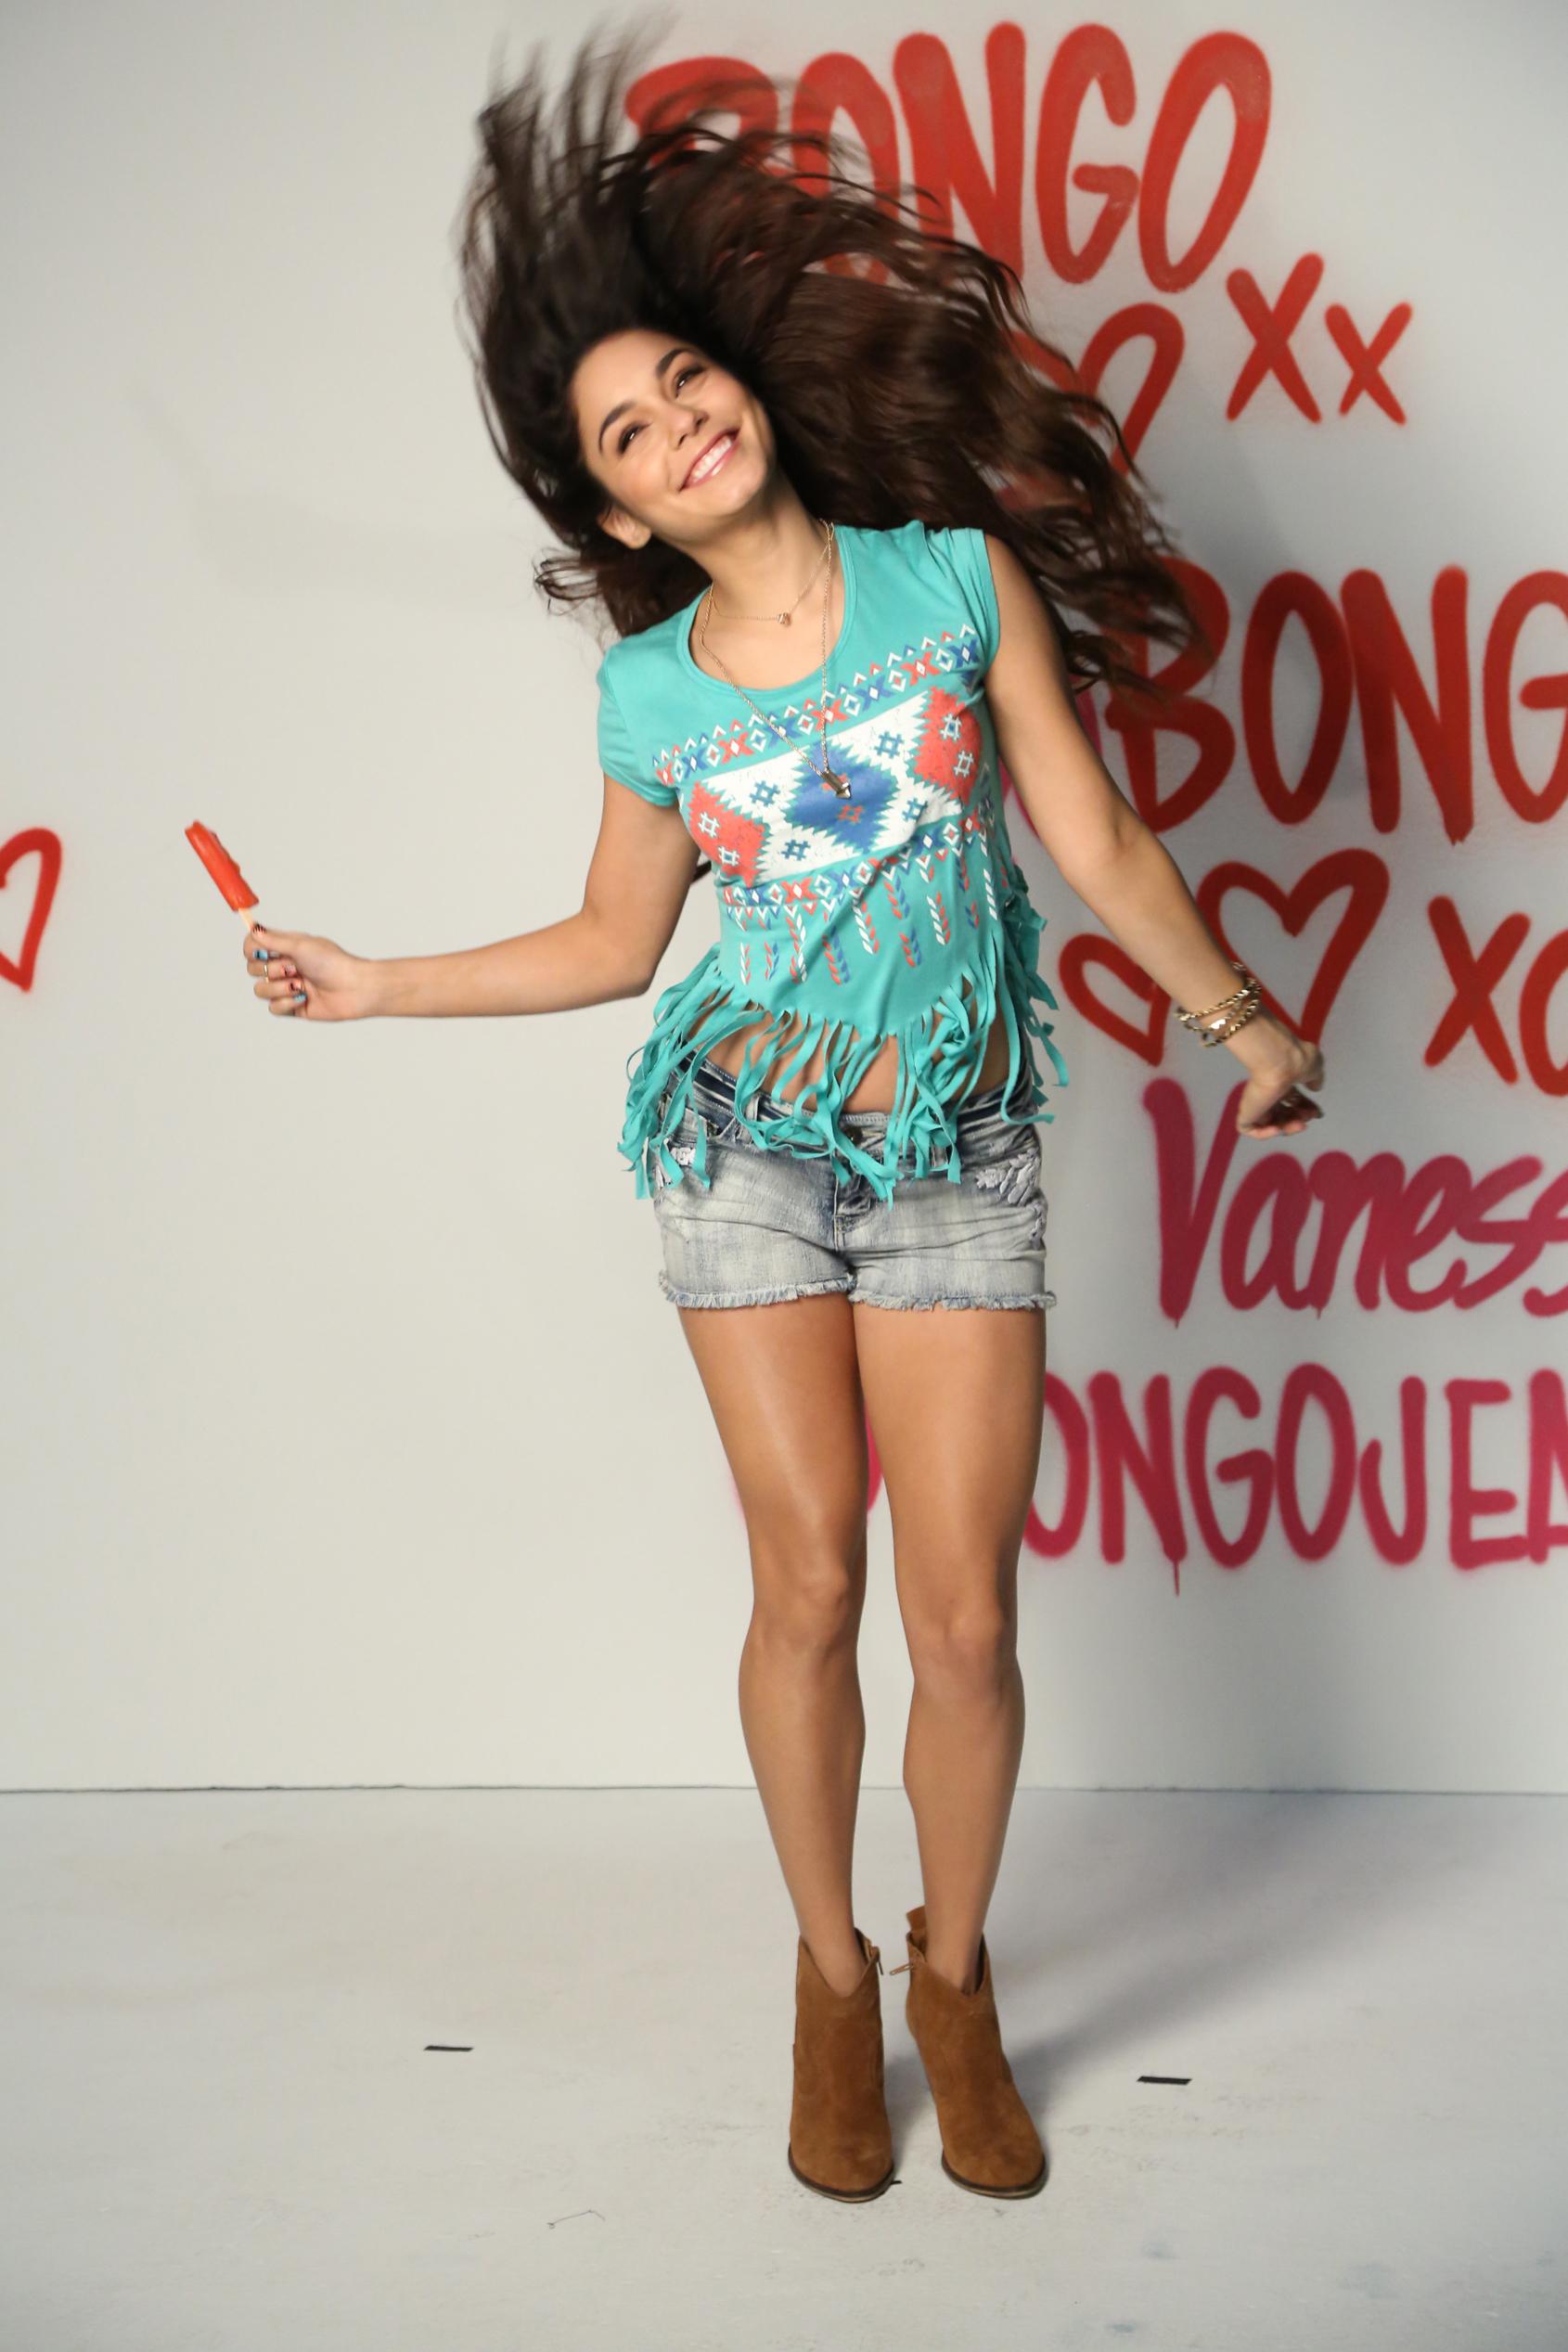 Vanessa hudgens bongo photoshoot - 3 part 1